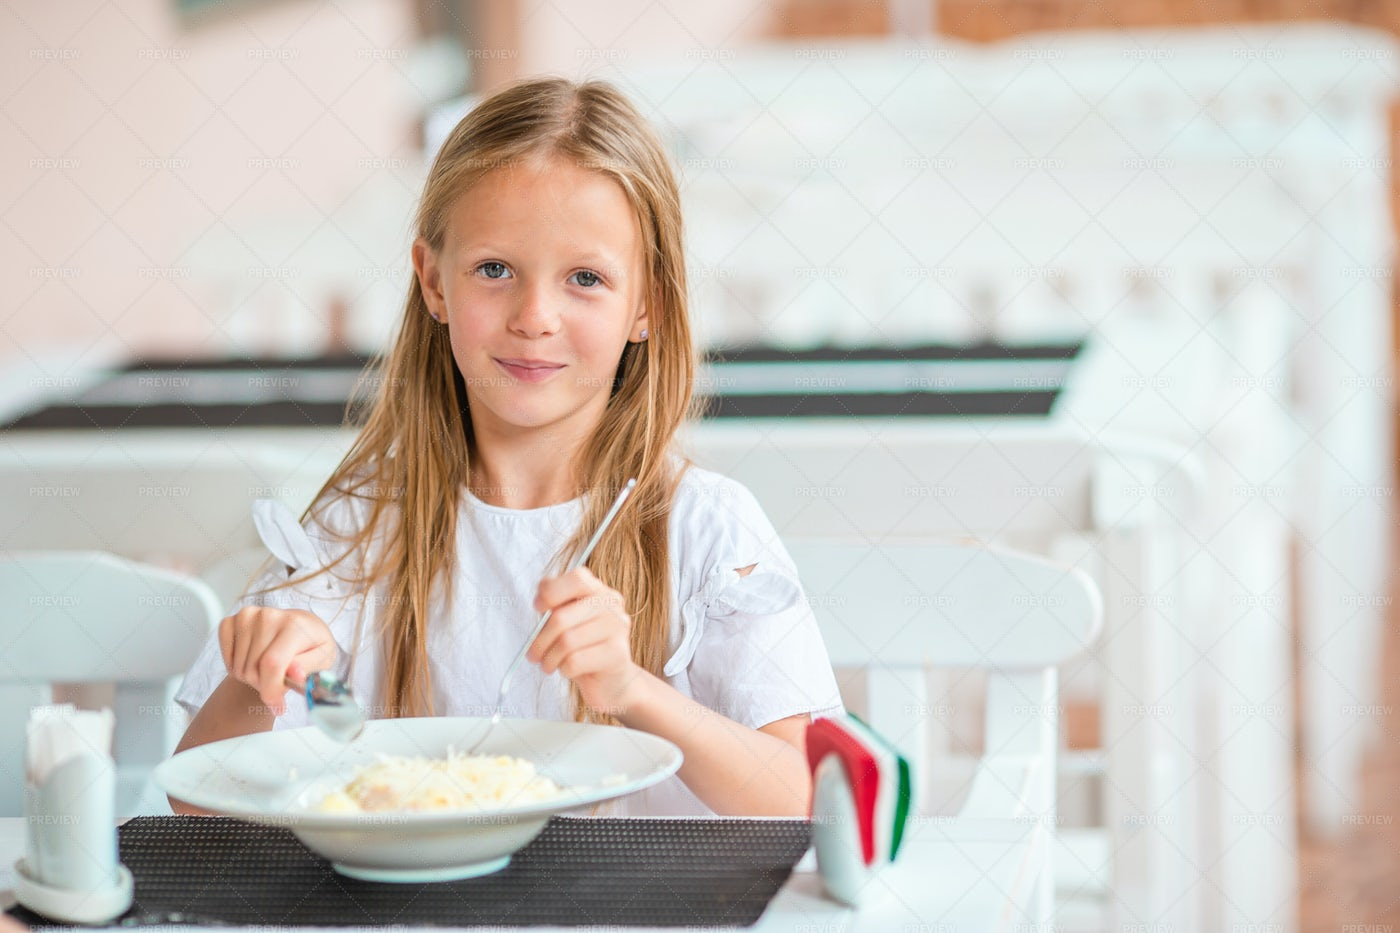 Young Girl Eating Breakfast: Stock Photos